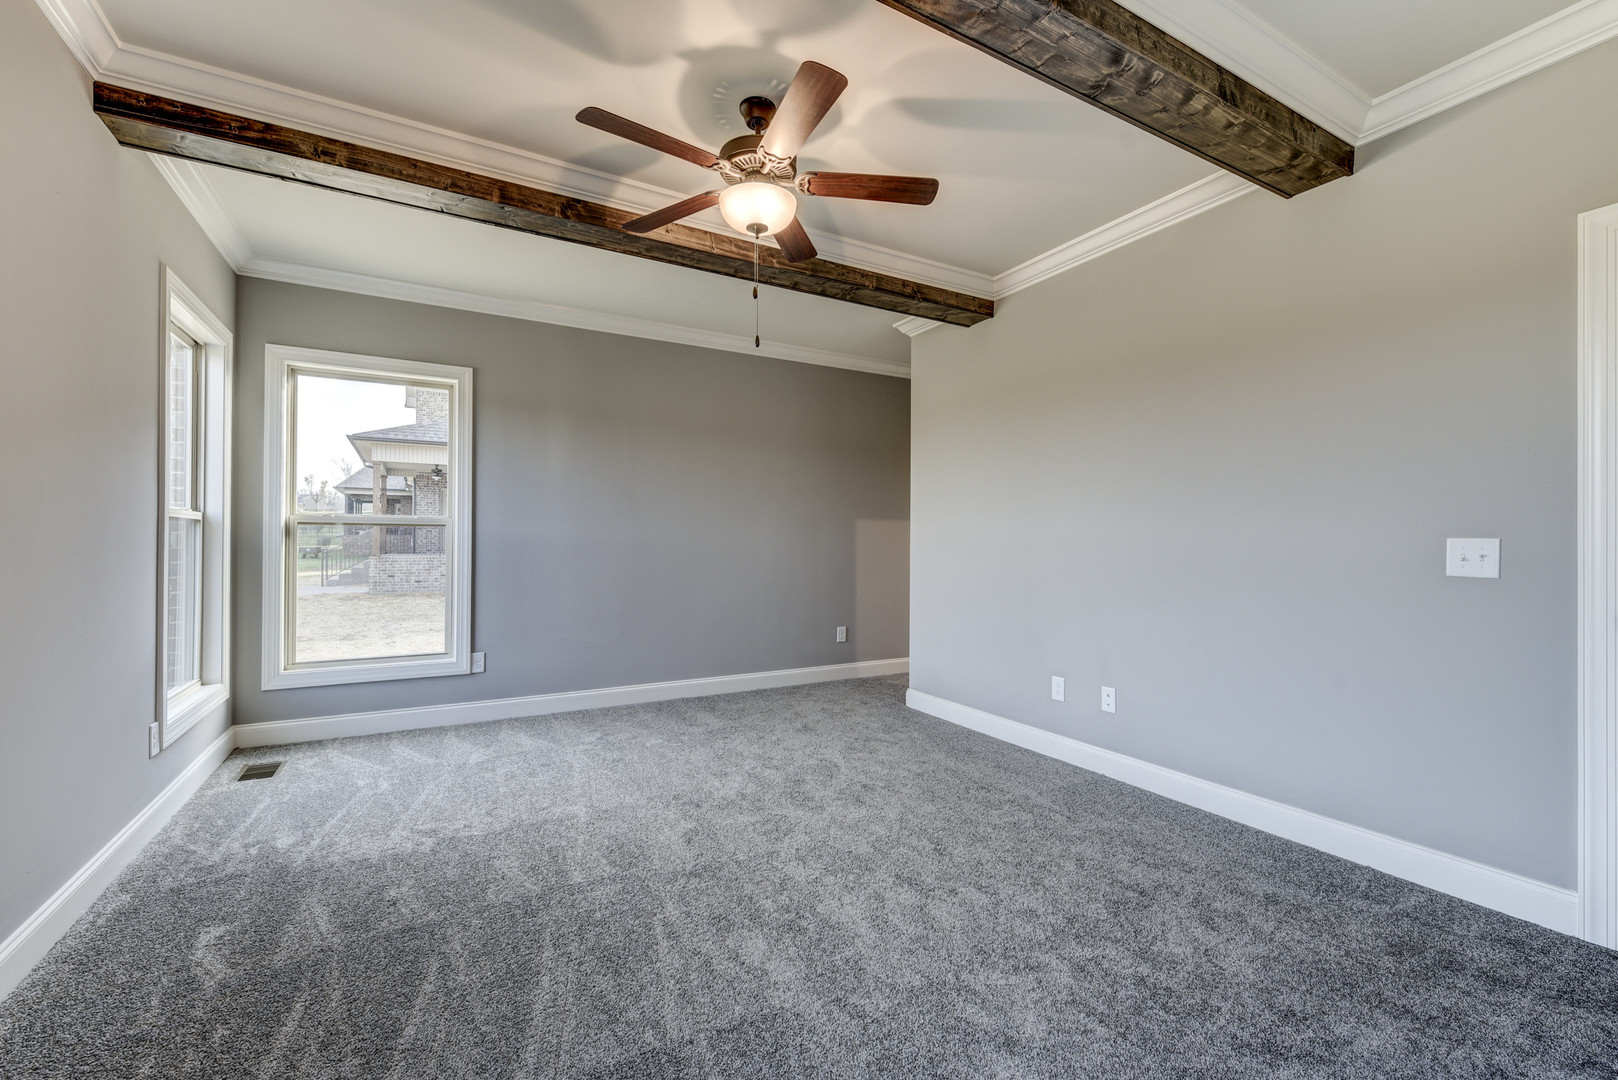 Lawson Master Bedroom